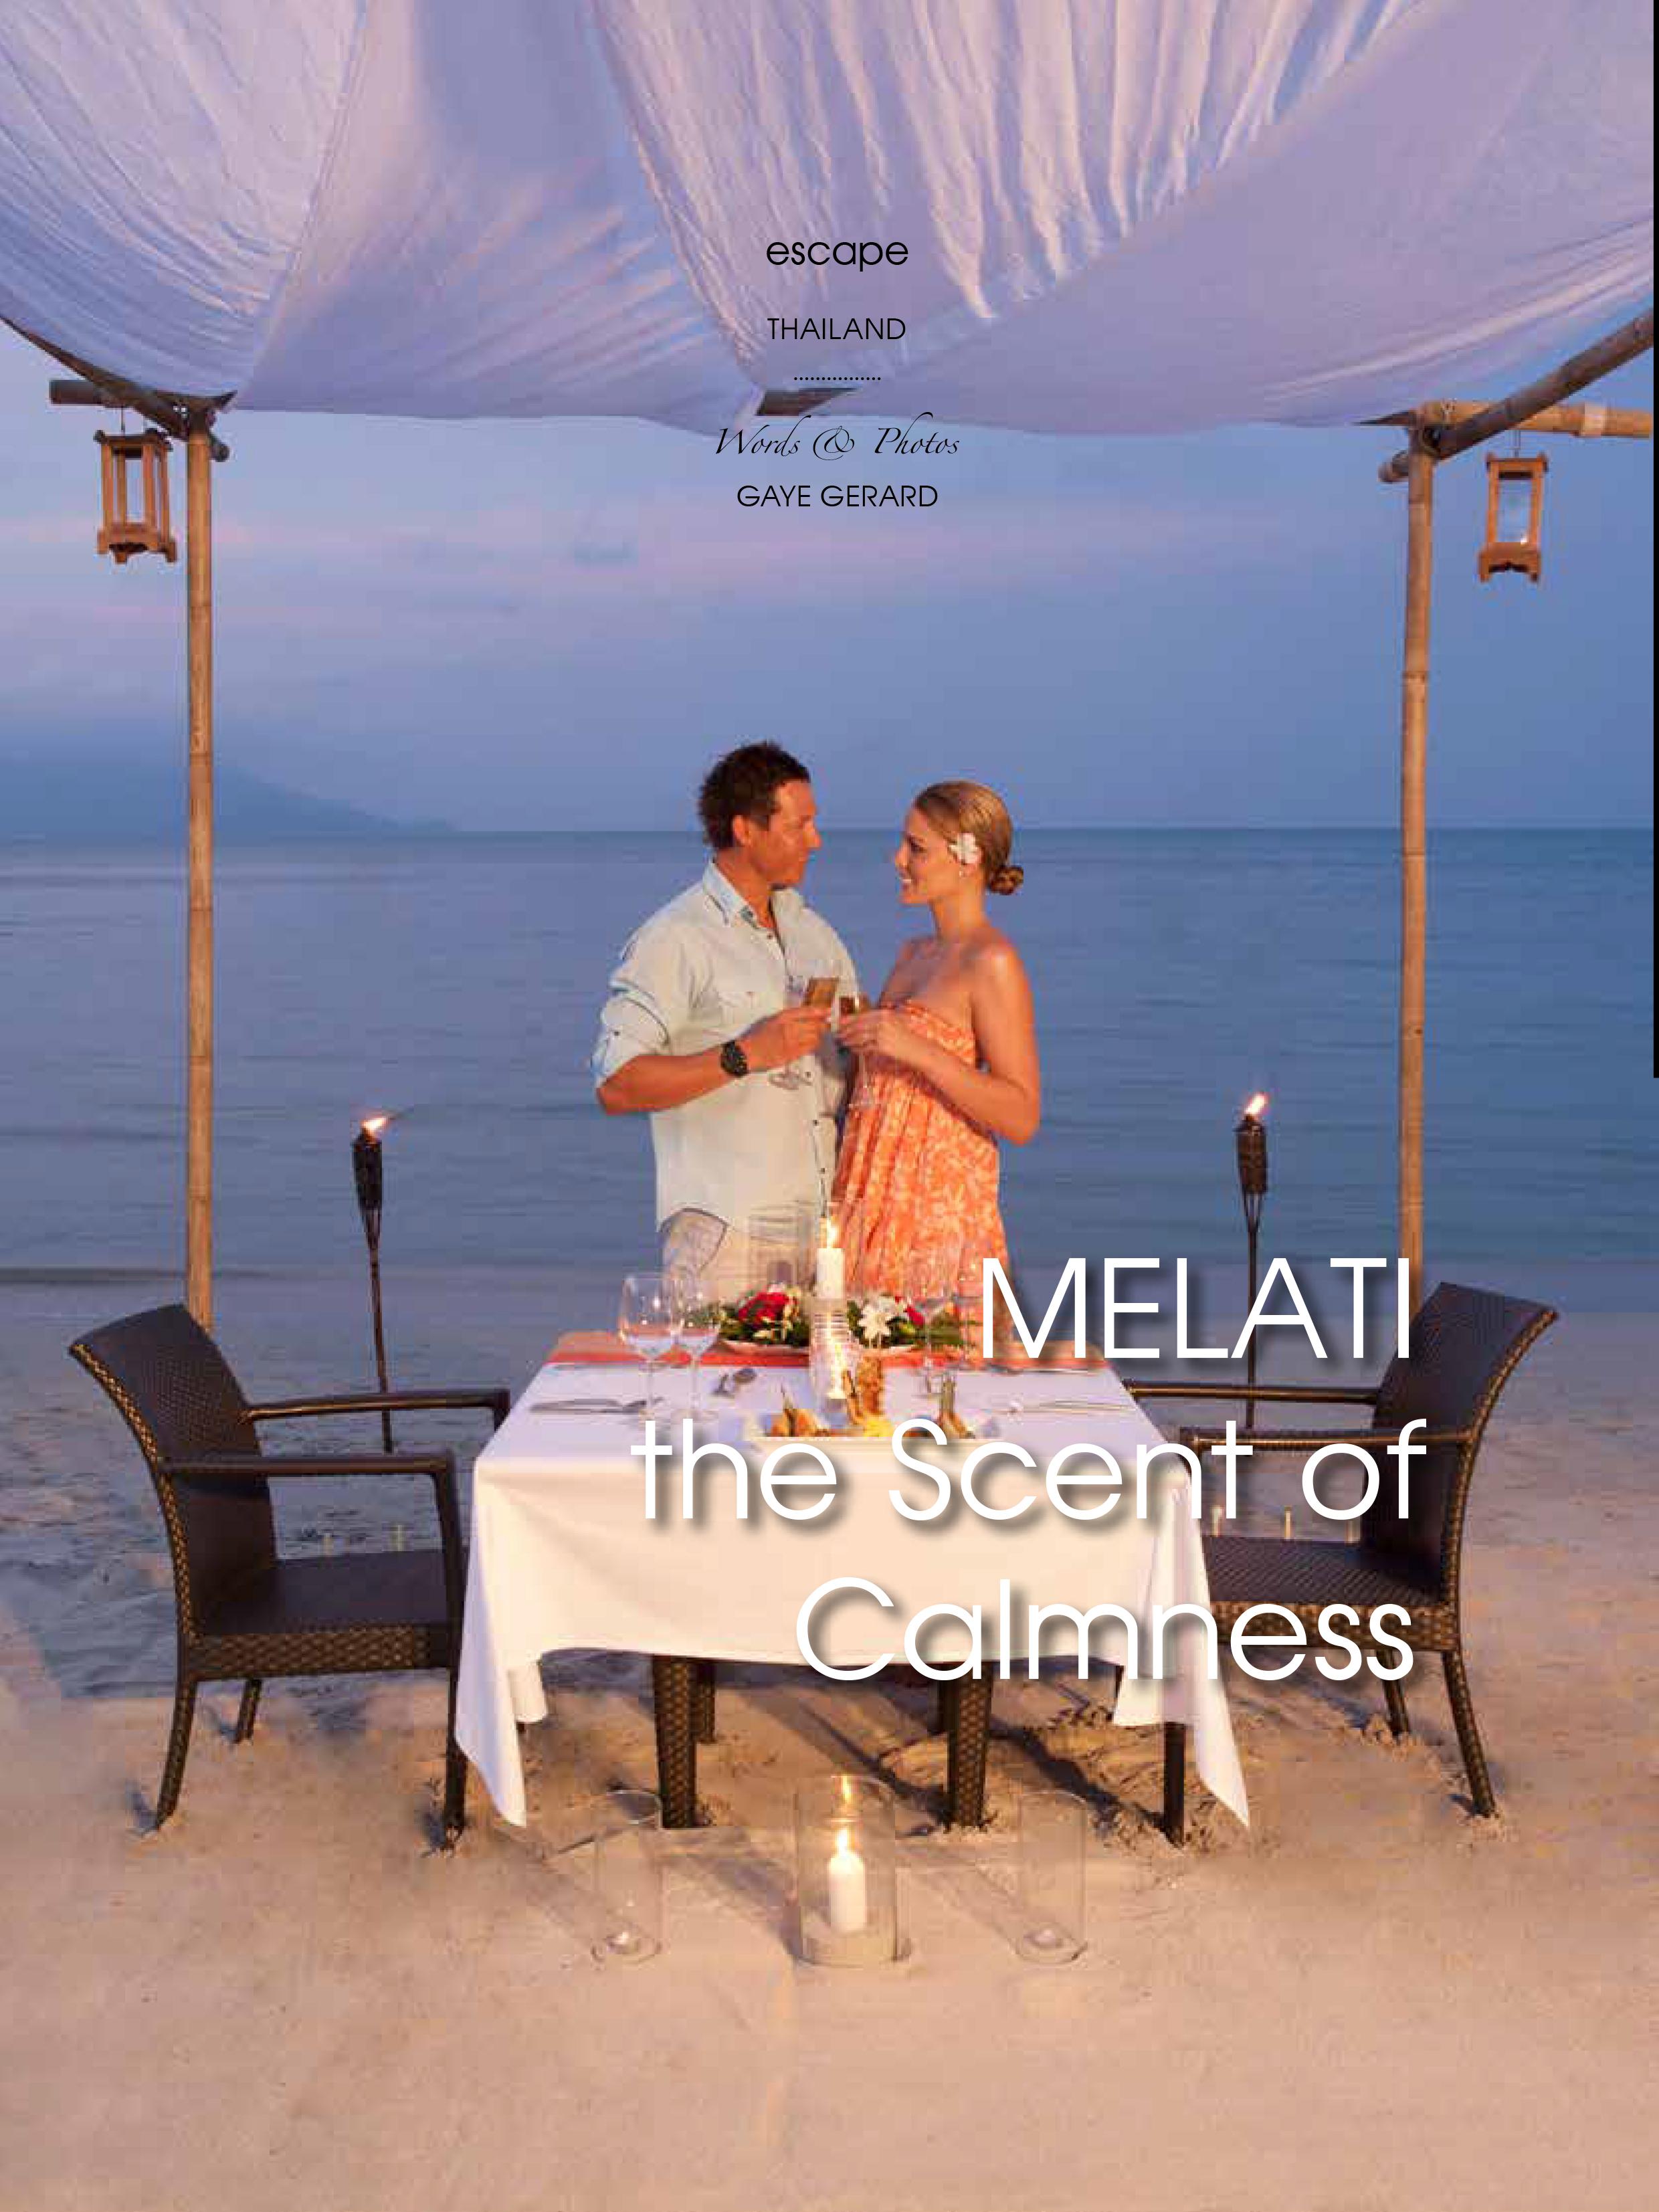 002- Melati Spa Resort ThailandTearsheet sample Gaye Gerard.jpg